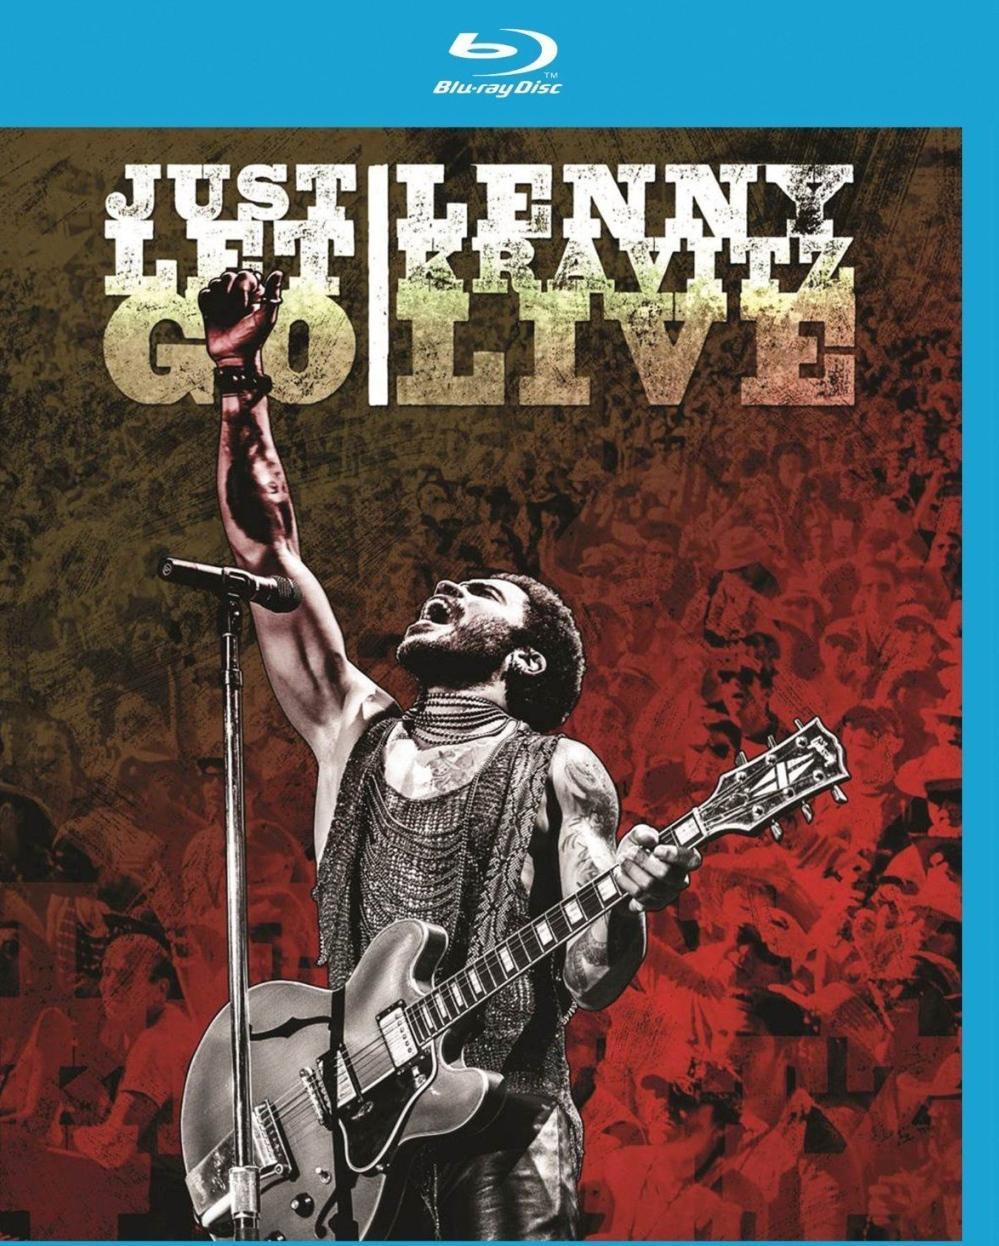 Let It Go Lenny Kravitz Live